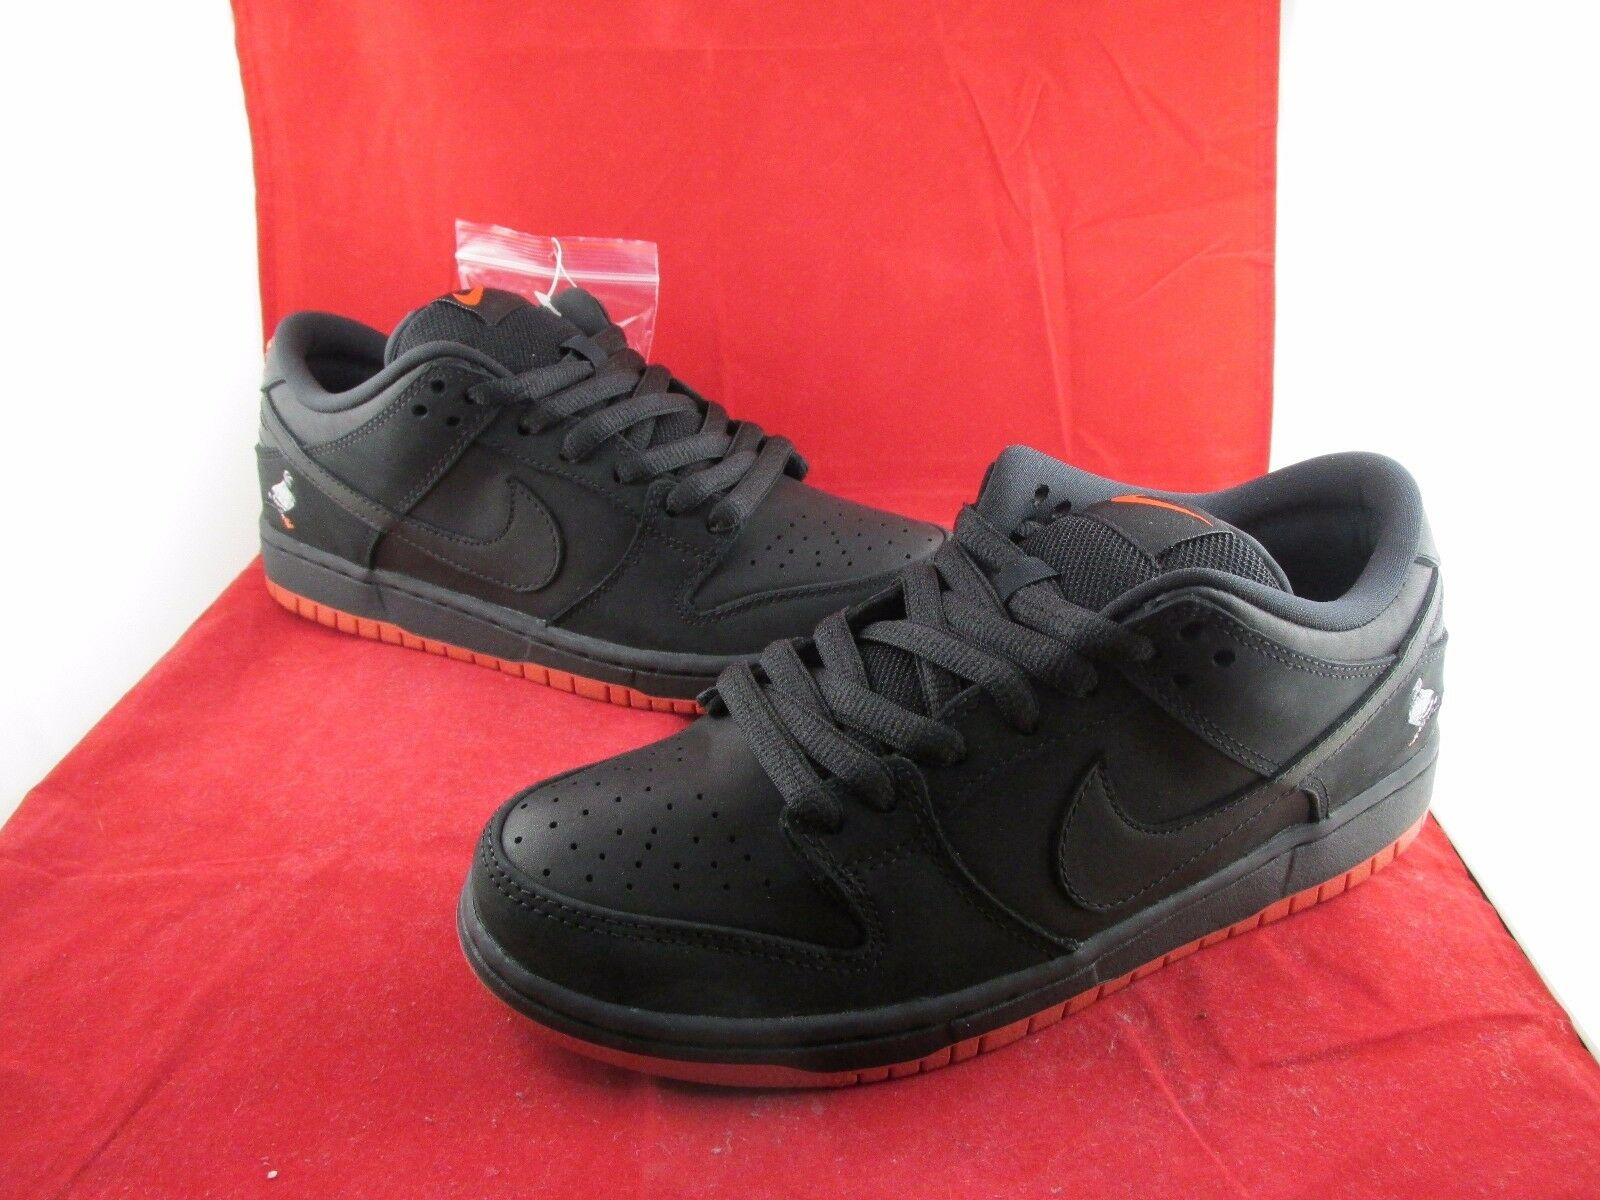 Nike SB Dunk Low TRD QS X Jeff Staple Pigeon 8 9 10 11 sportslocker 883232-008